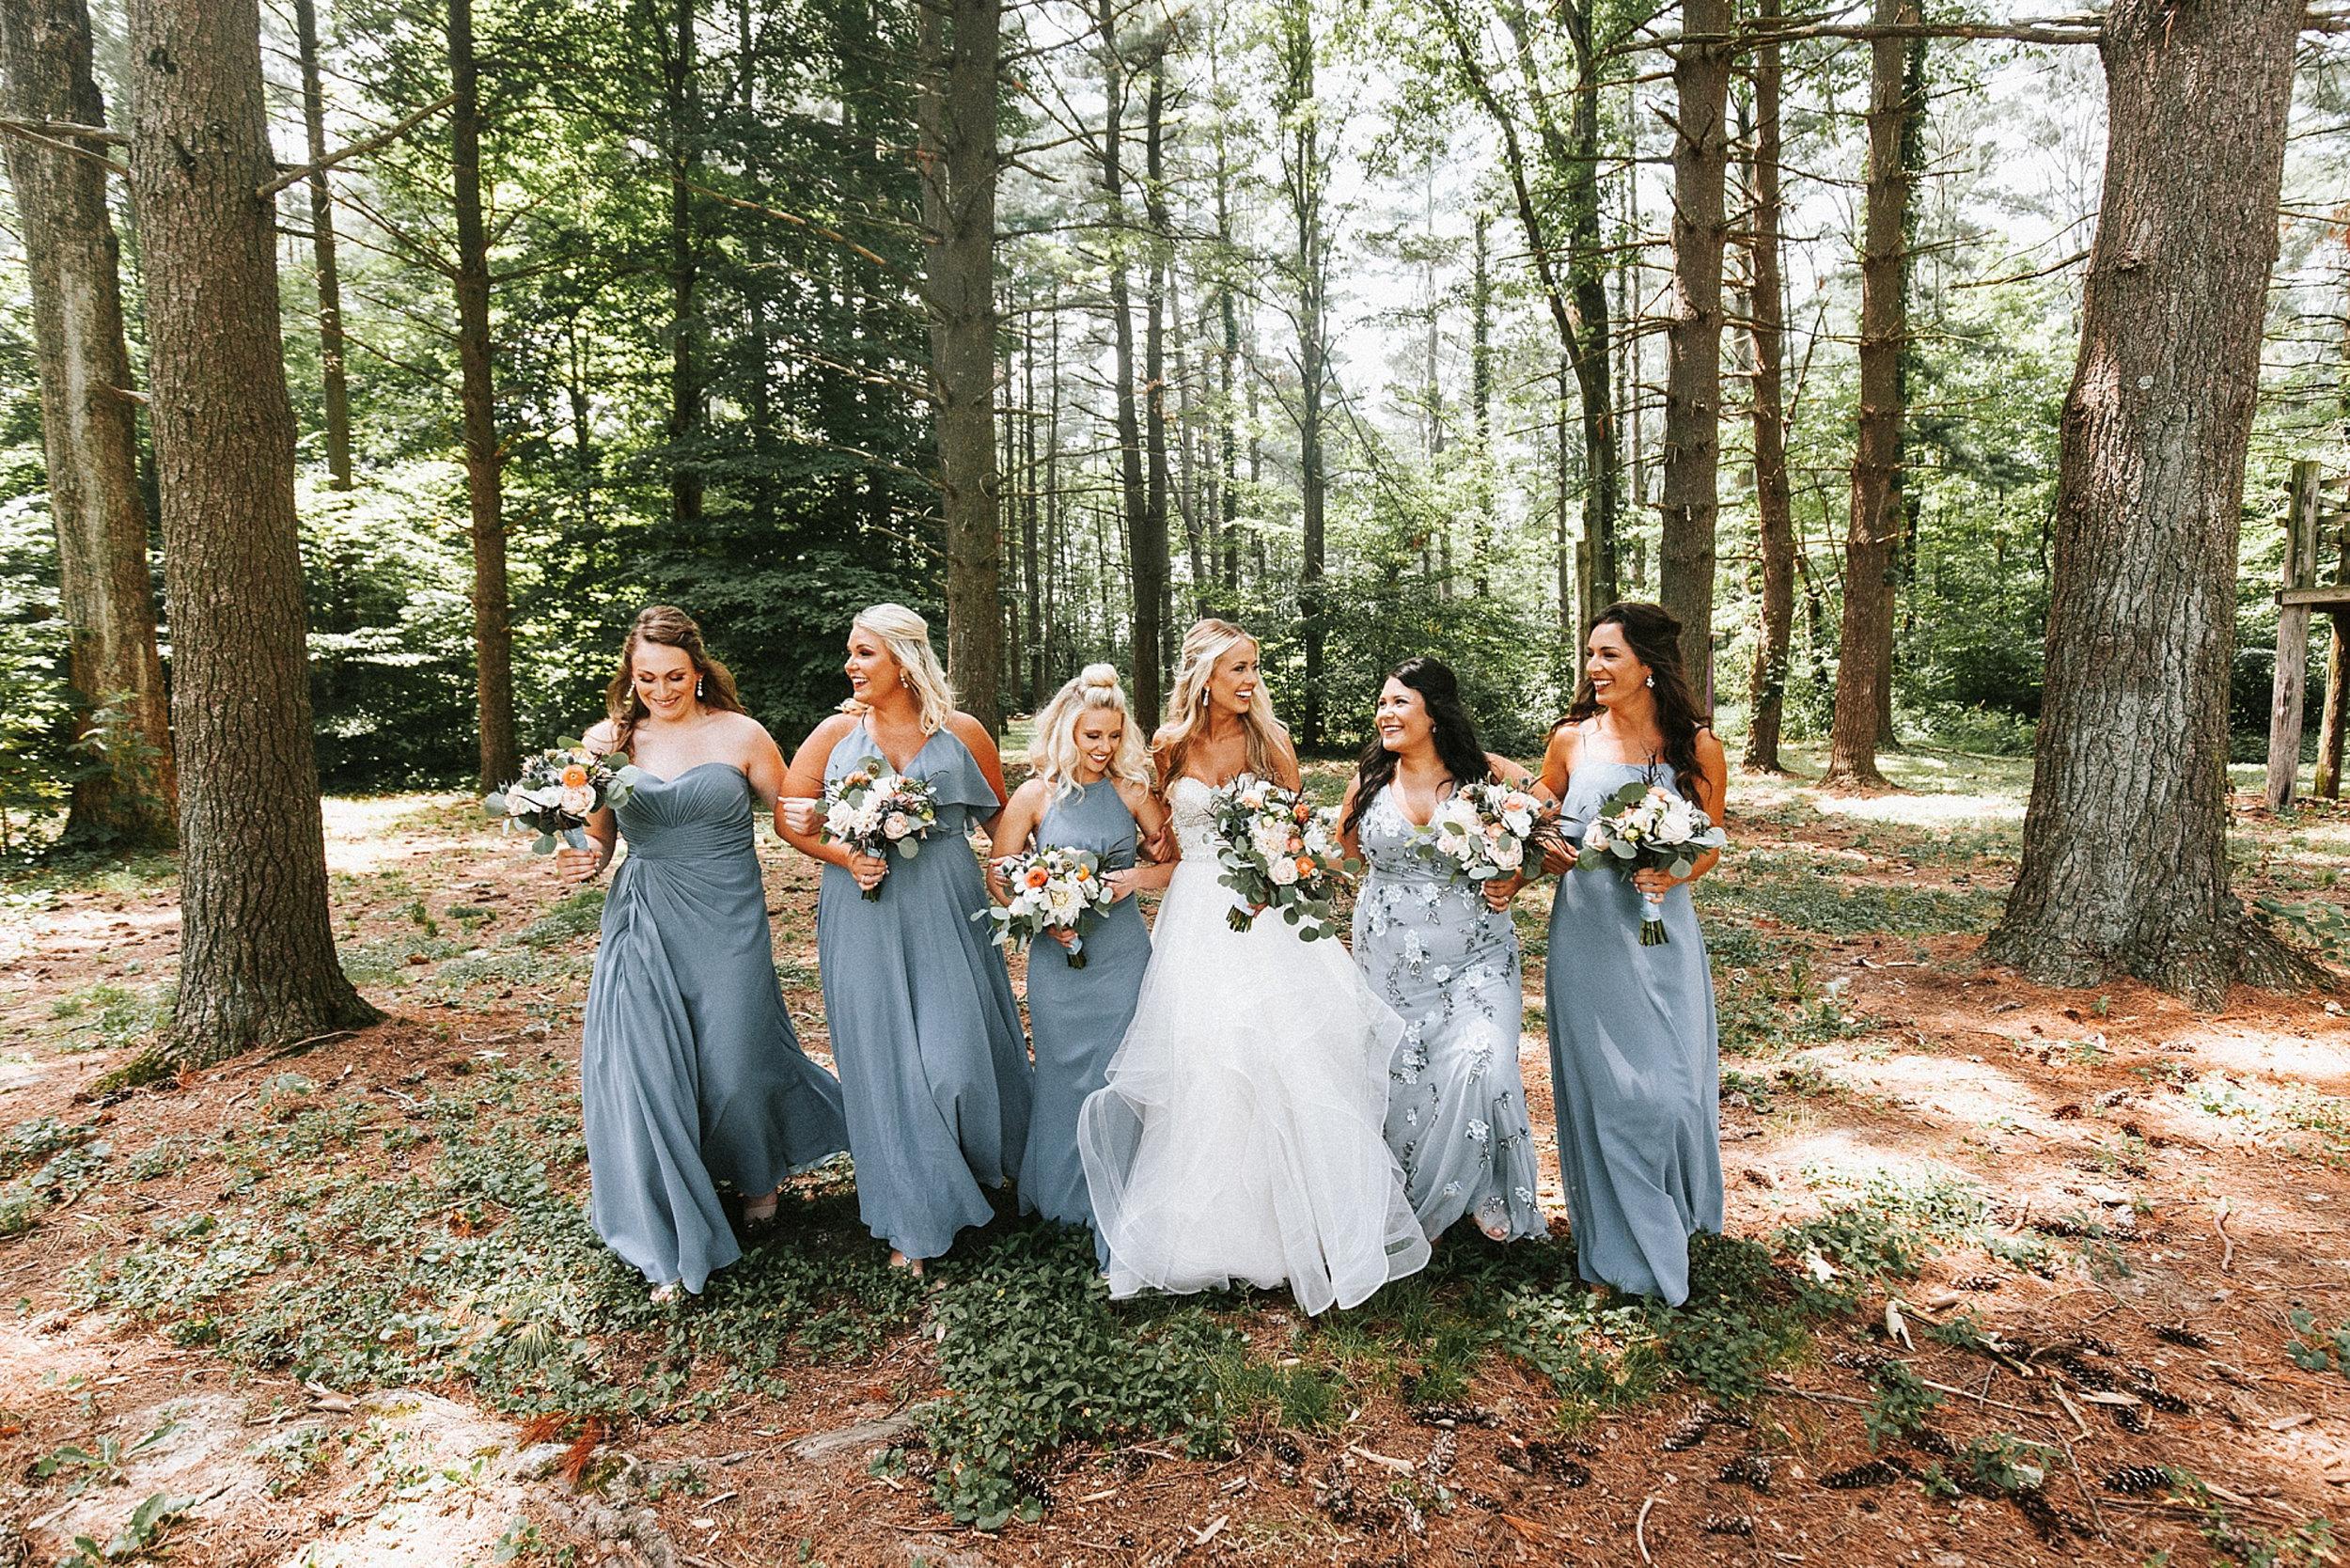 Brooke Townsend Photography - Cincinnati Wedding Photographer (19 of 153).jpg